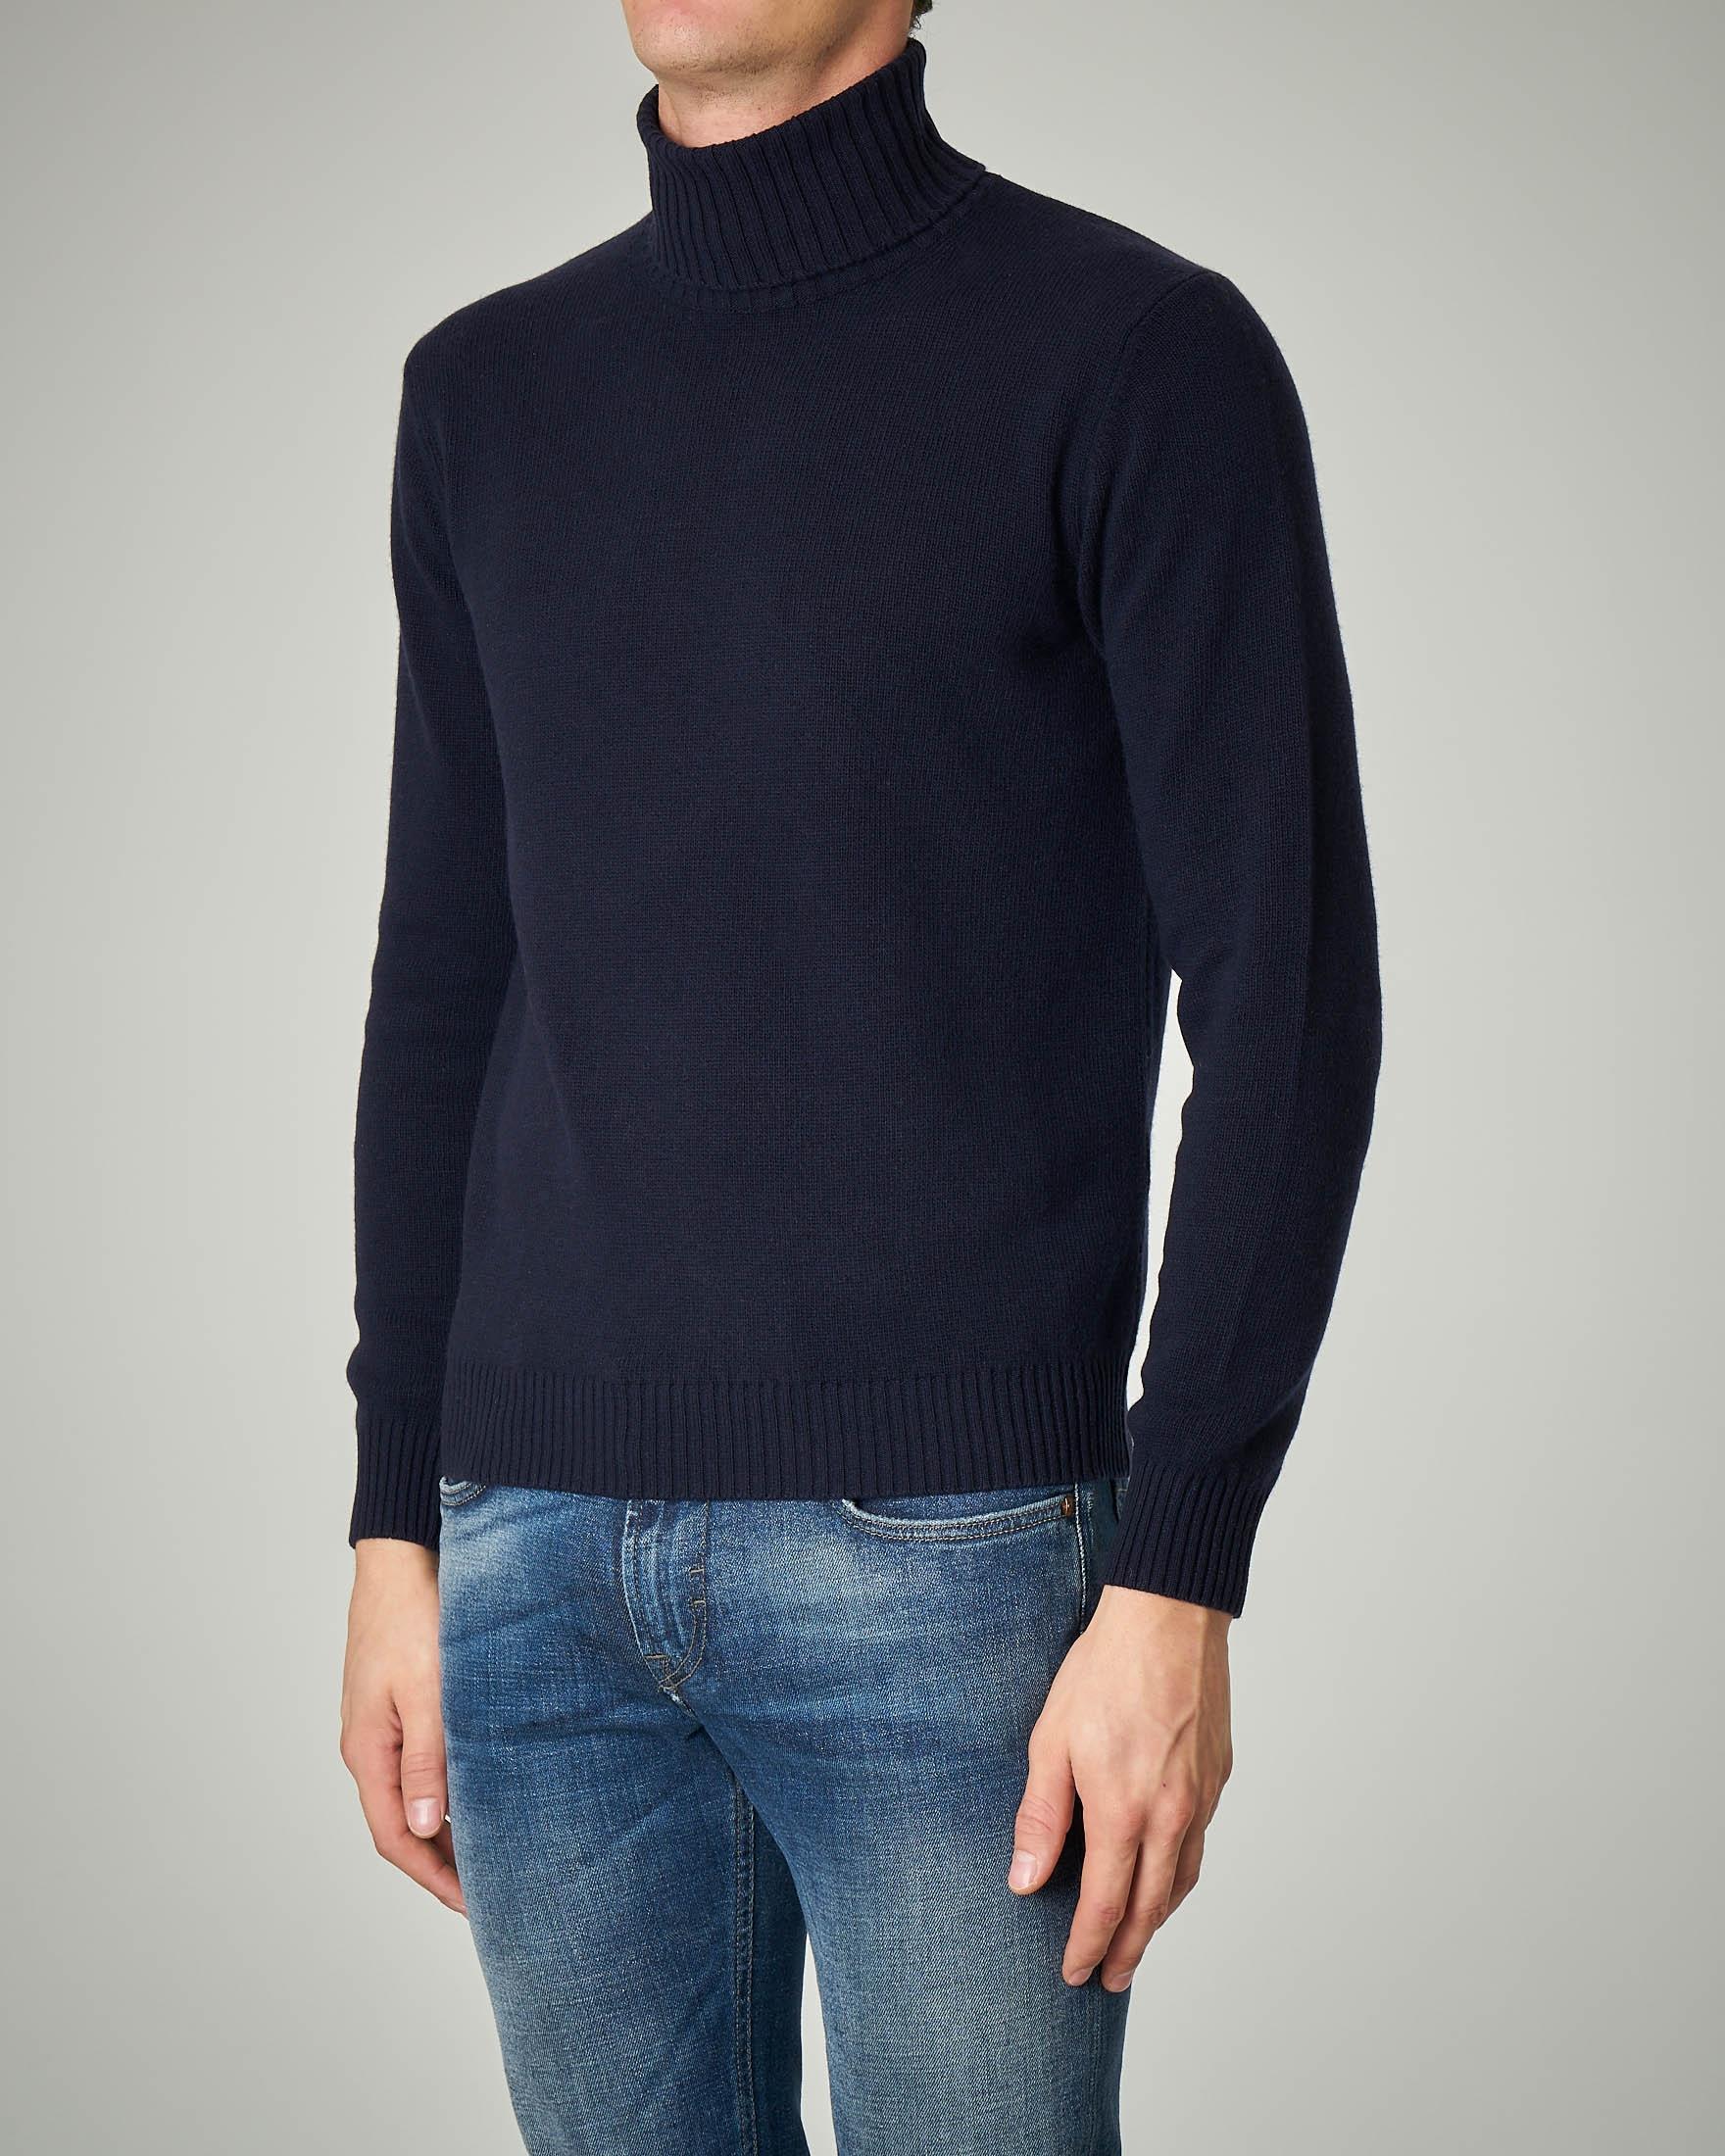 Dolcevita blu moulinè in lana e cachemire finezza 7